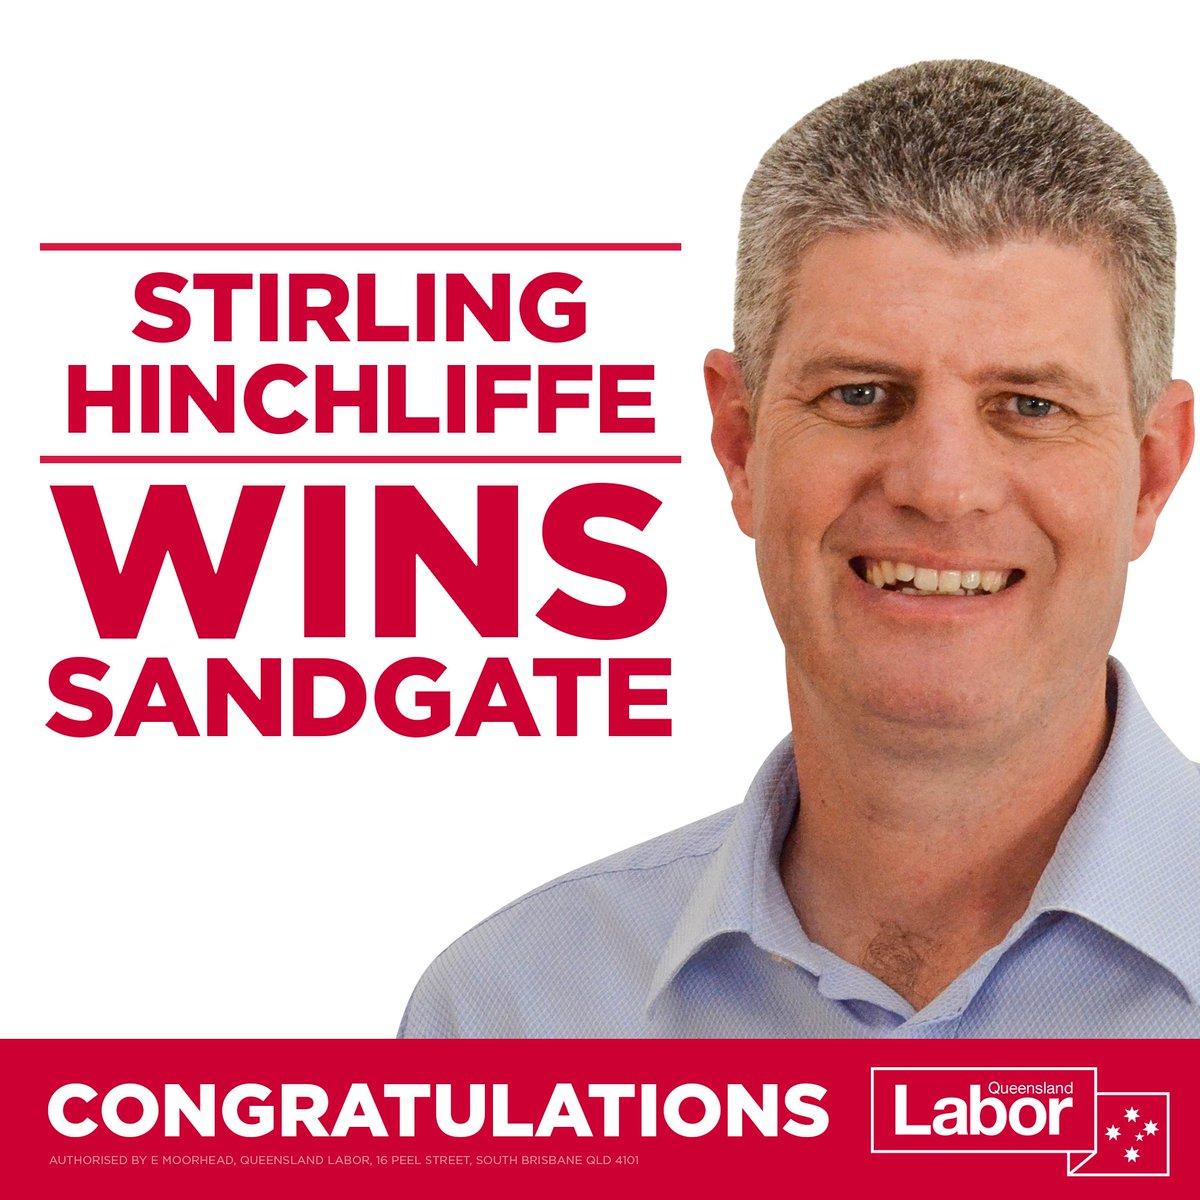 Queensland Labor on Twitter: